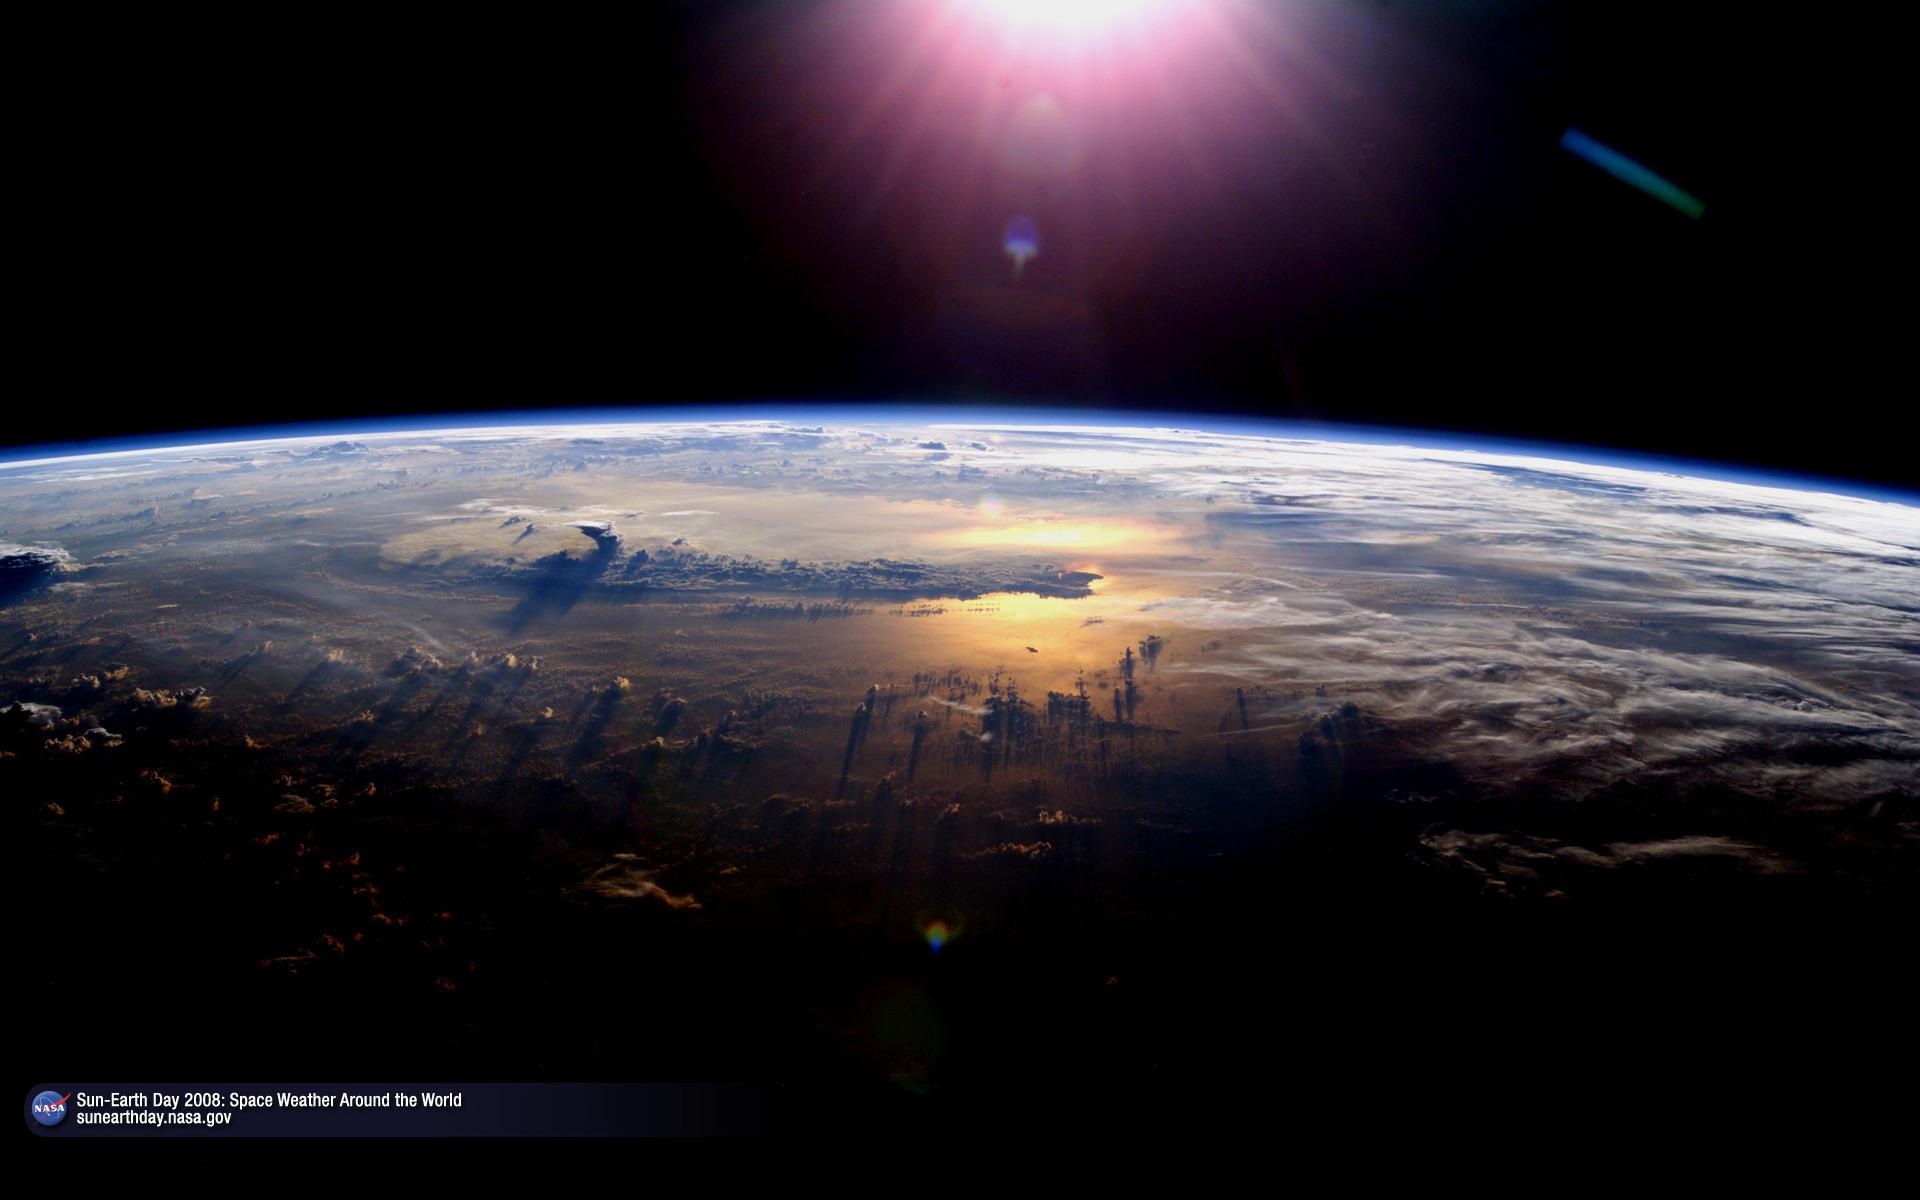 earth and sun - Astronomy Jobs At Nasa